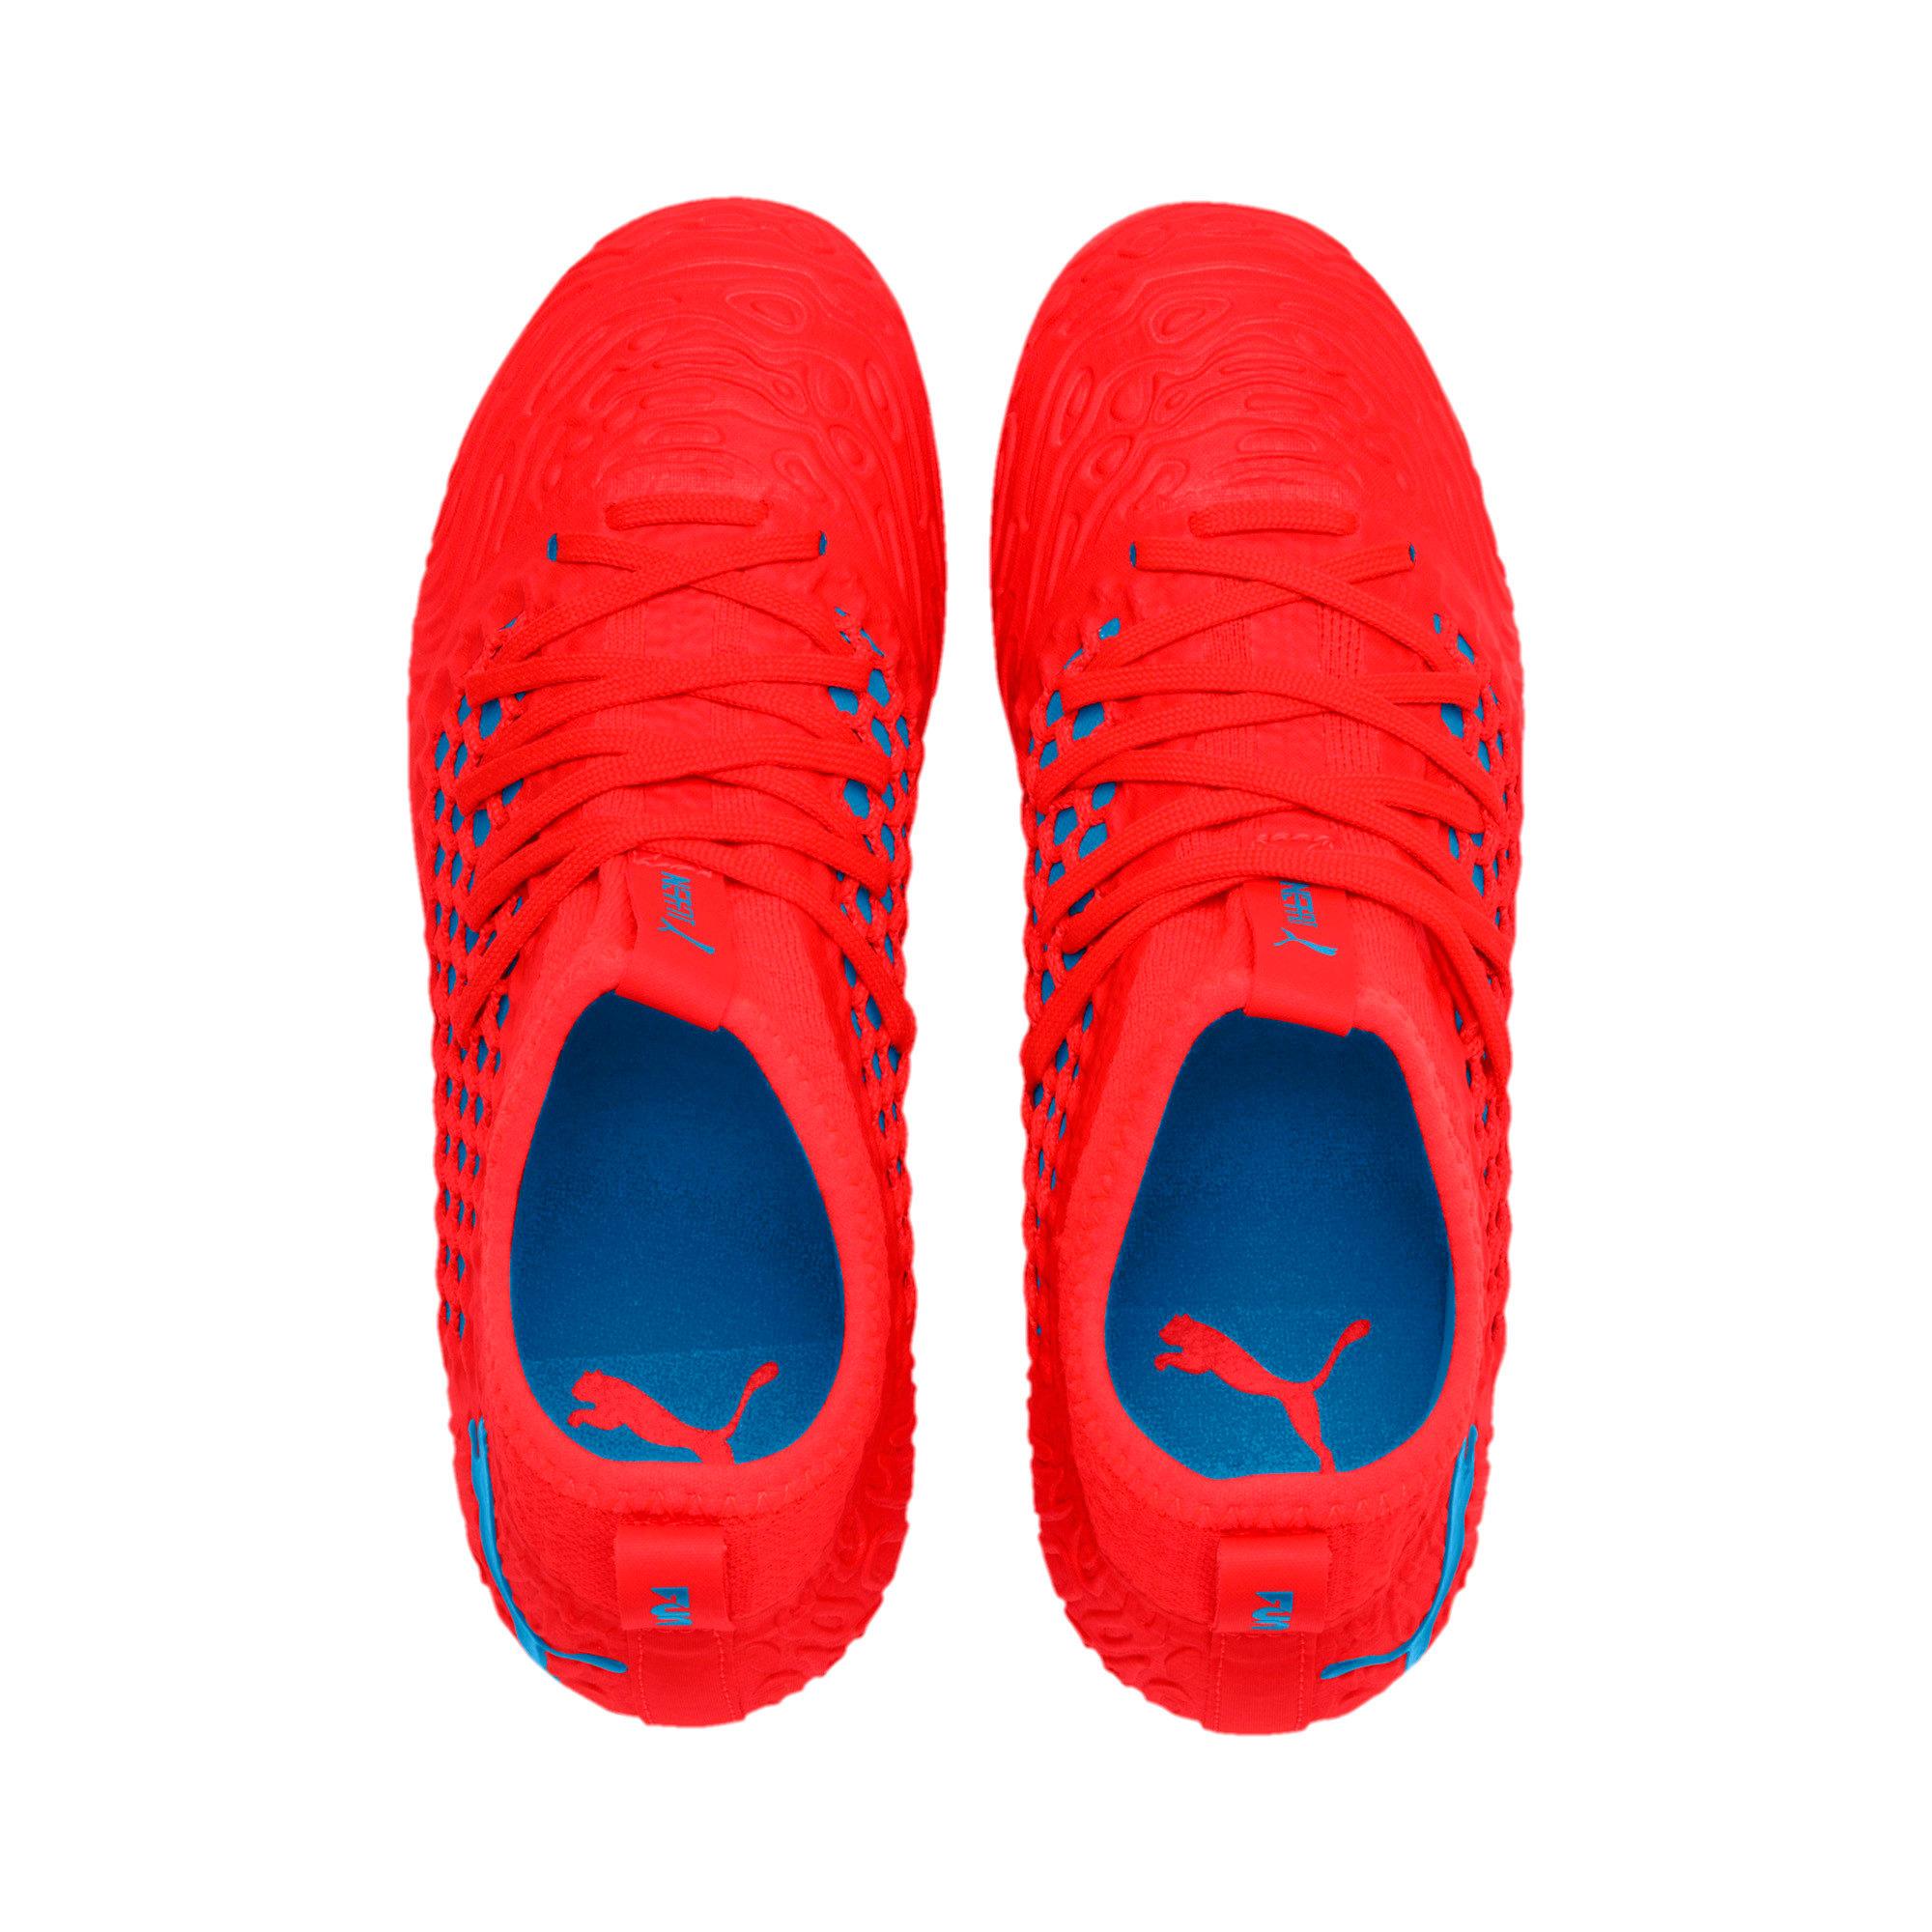 Thumbnail 6 of FUTURE 19.3 NETFIT FG/AG Soccer Cleats JR, Red Blast-Bleu Azur, medium